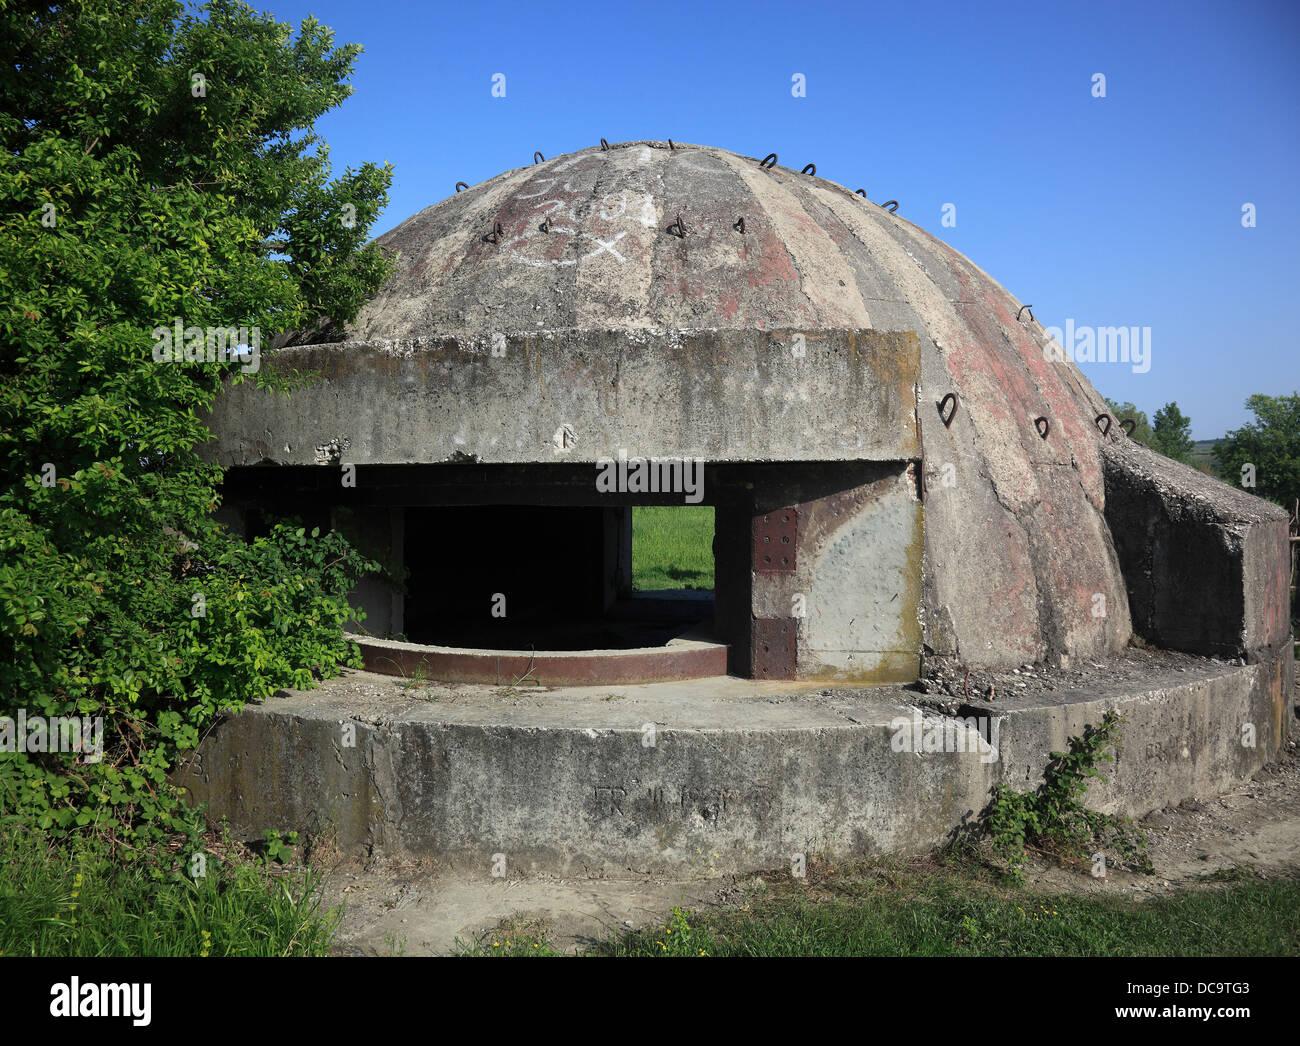 Bunker from the time of Enver Hoxha, near Berat, Albania - Stock Image